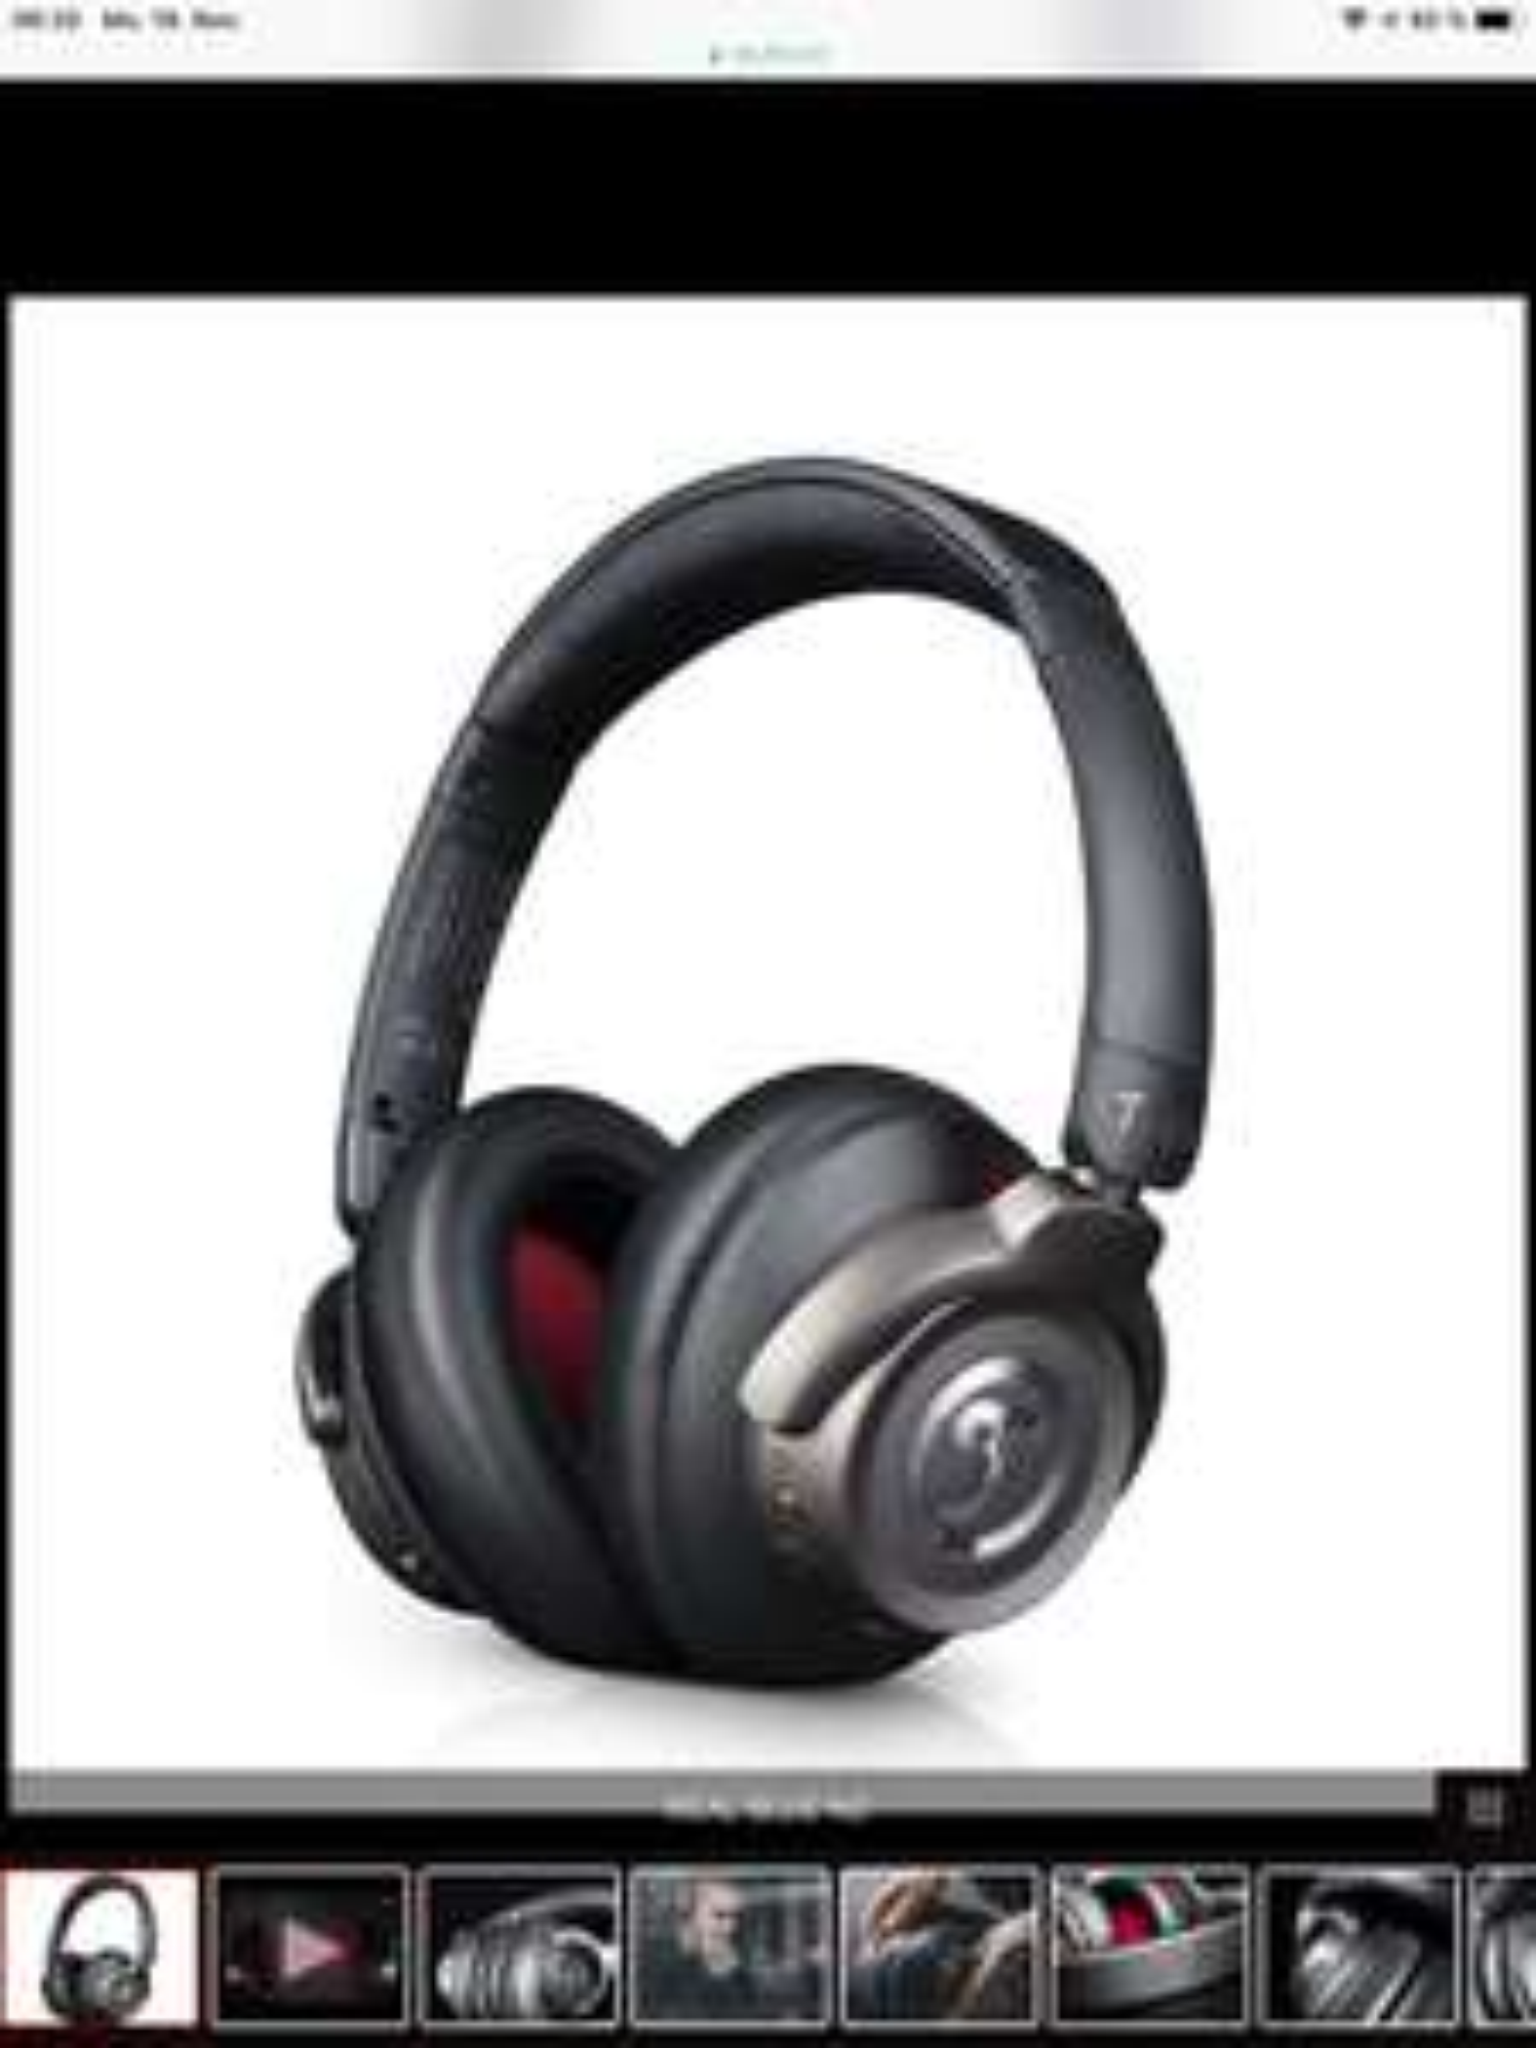 Teufel - REAL BLUE NC - HD-Bluetooth-Kopfhörer - Noise Cancelling